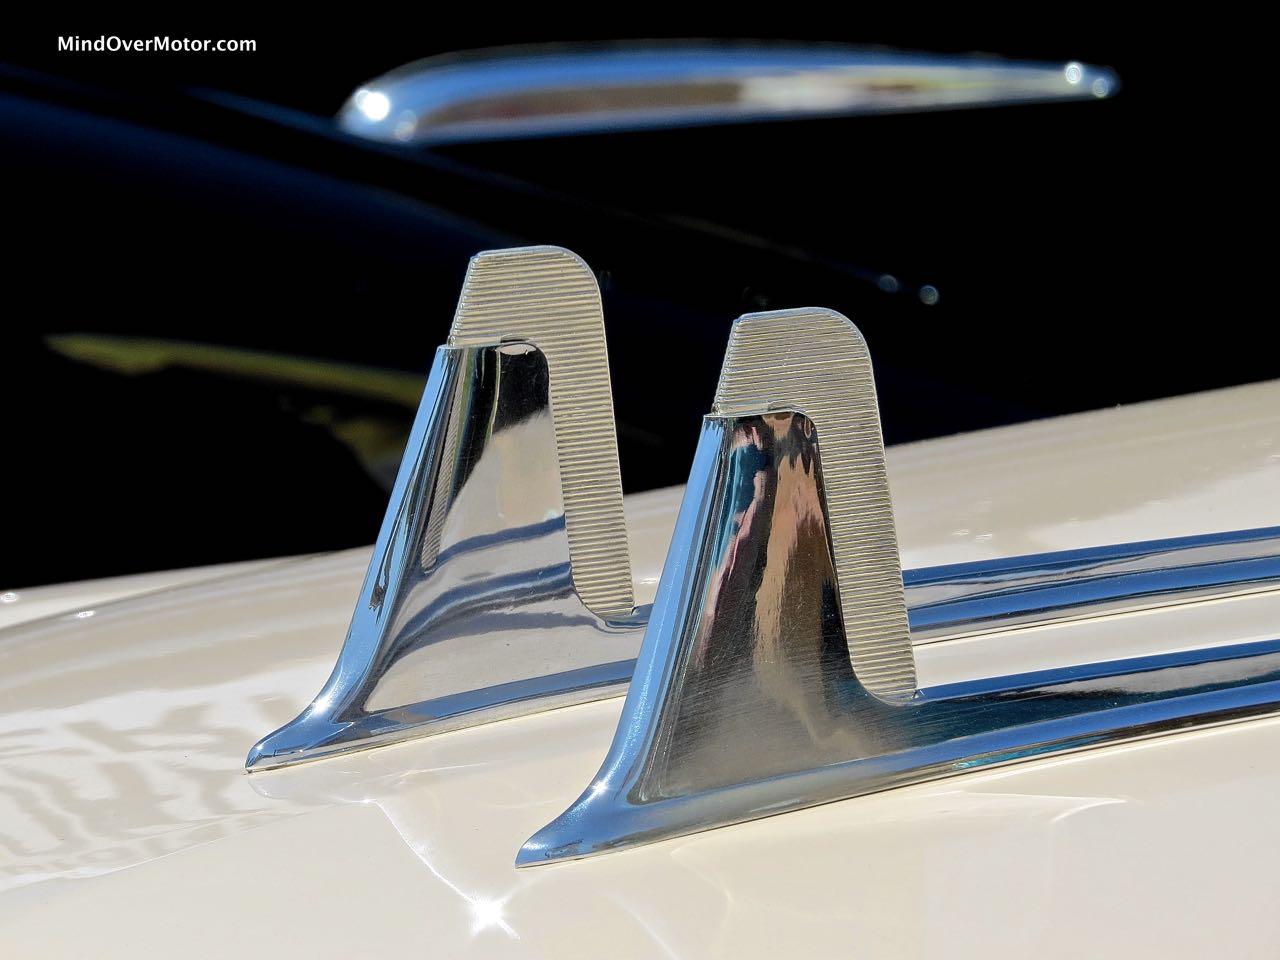 1956 Cadillac Eldorado Hood Ornament Detail